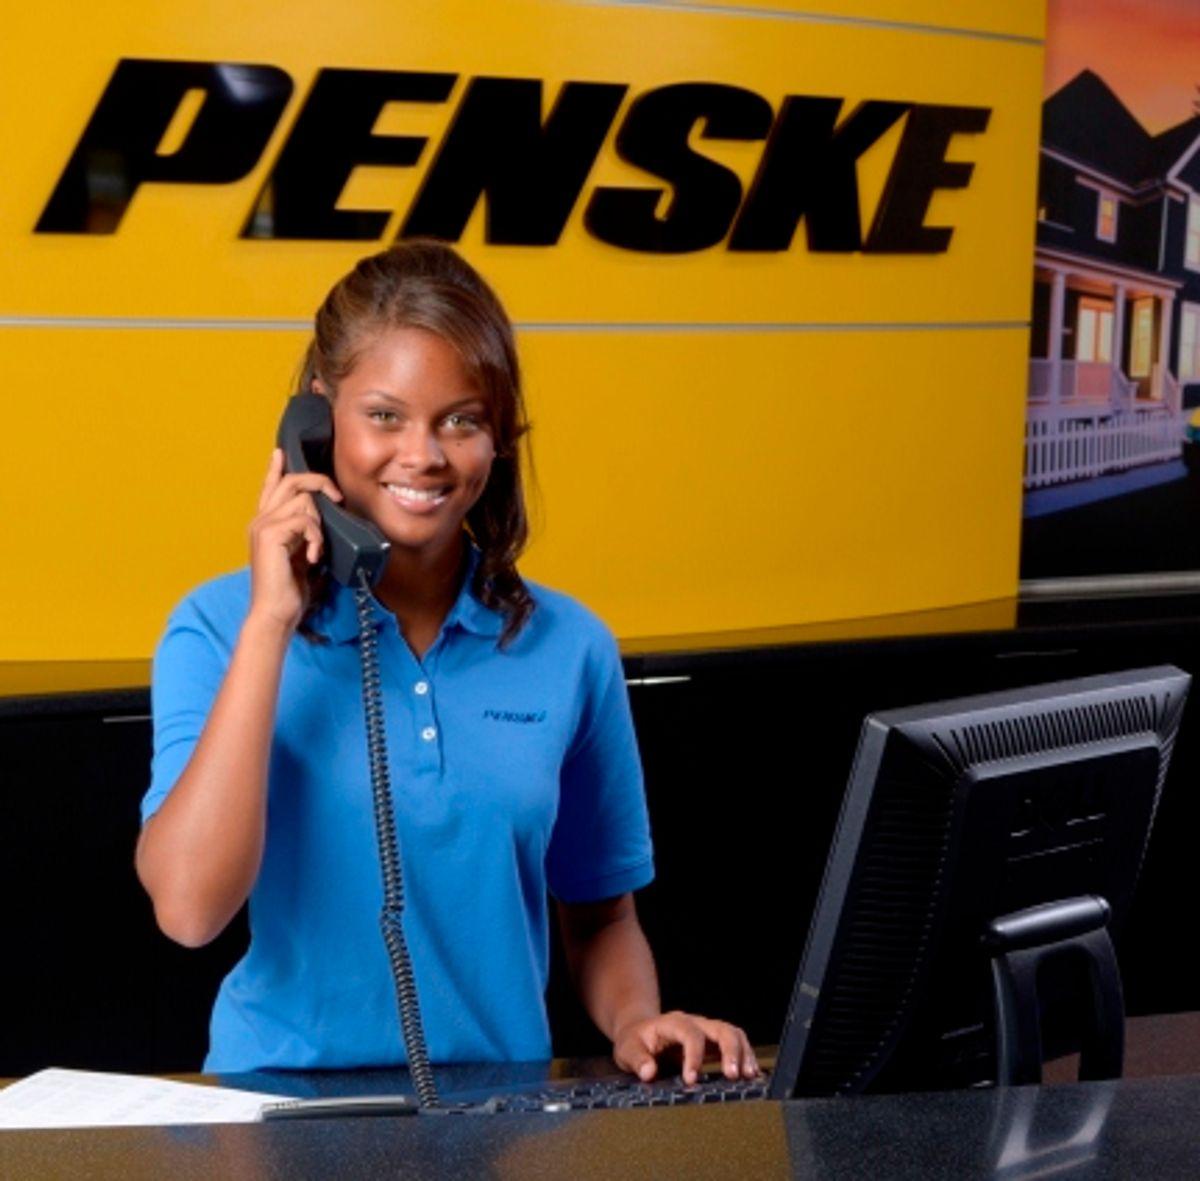 Penske to Attend West Chester University Career Fair